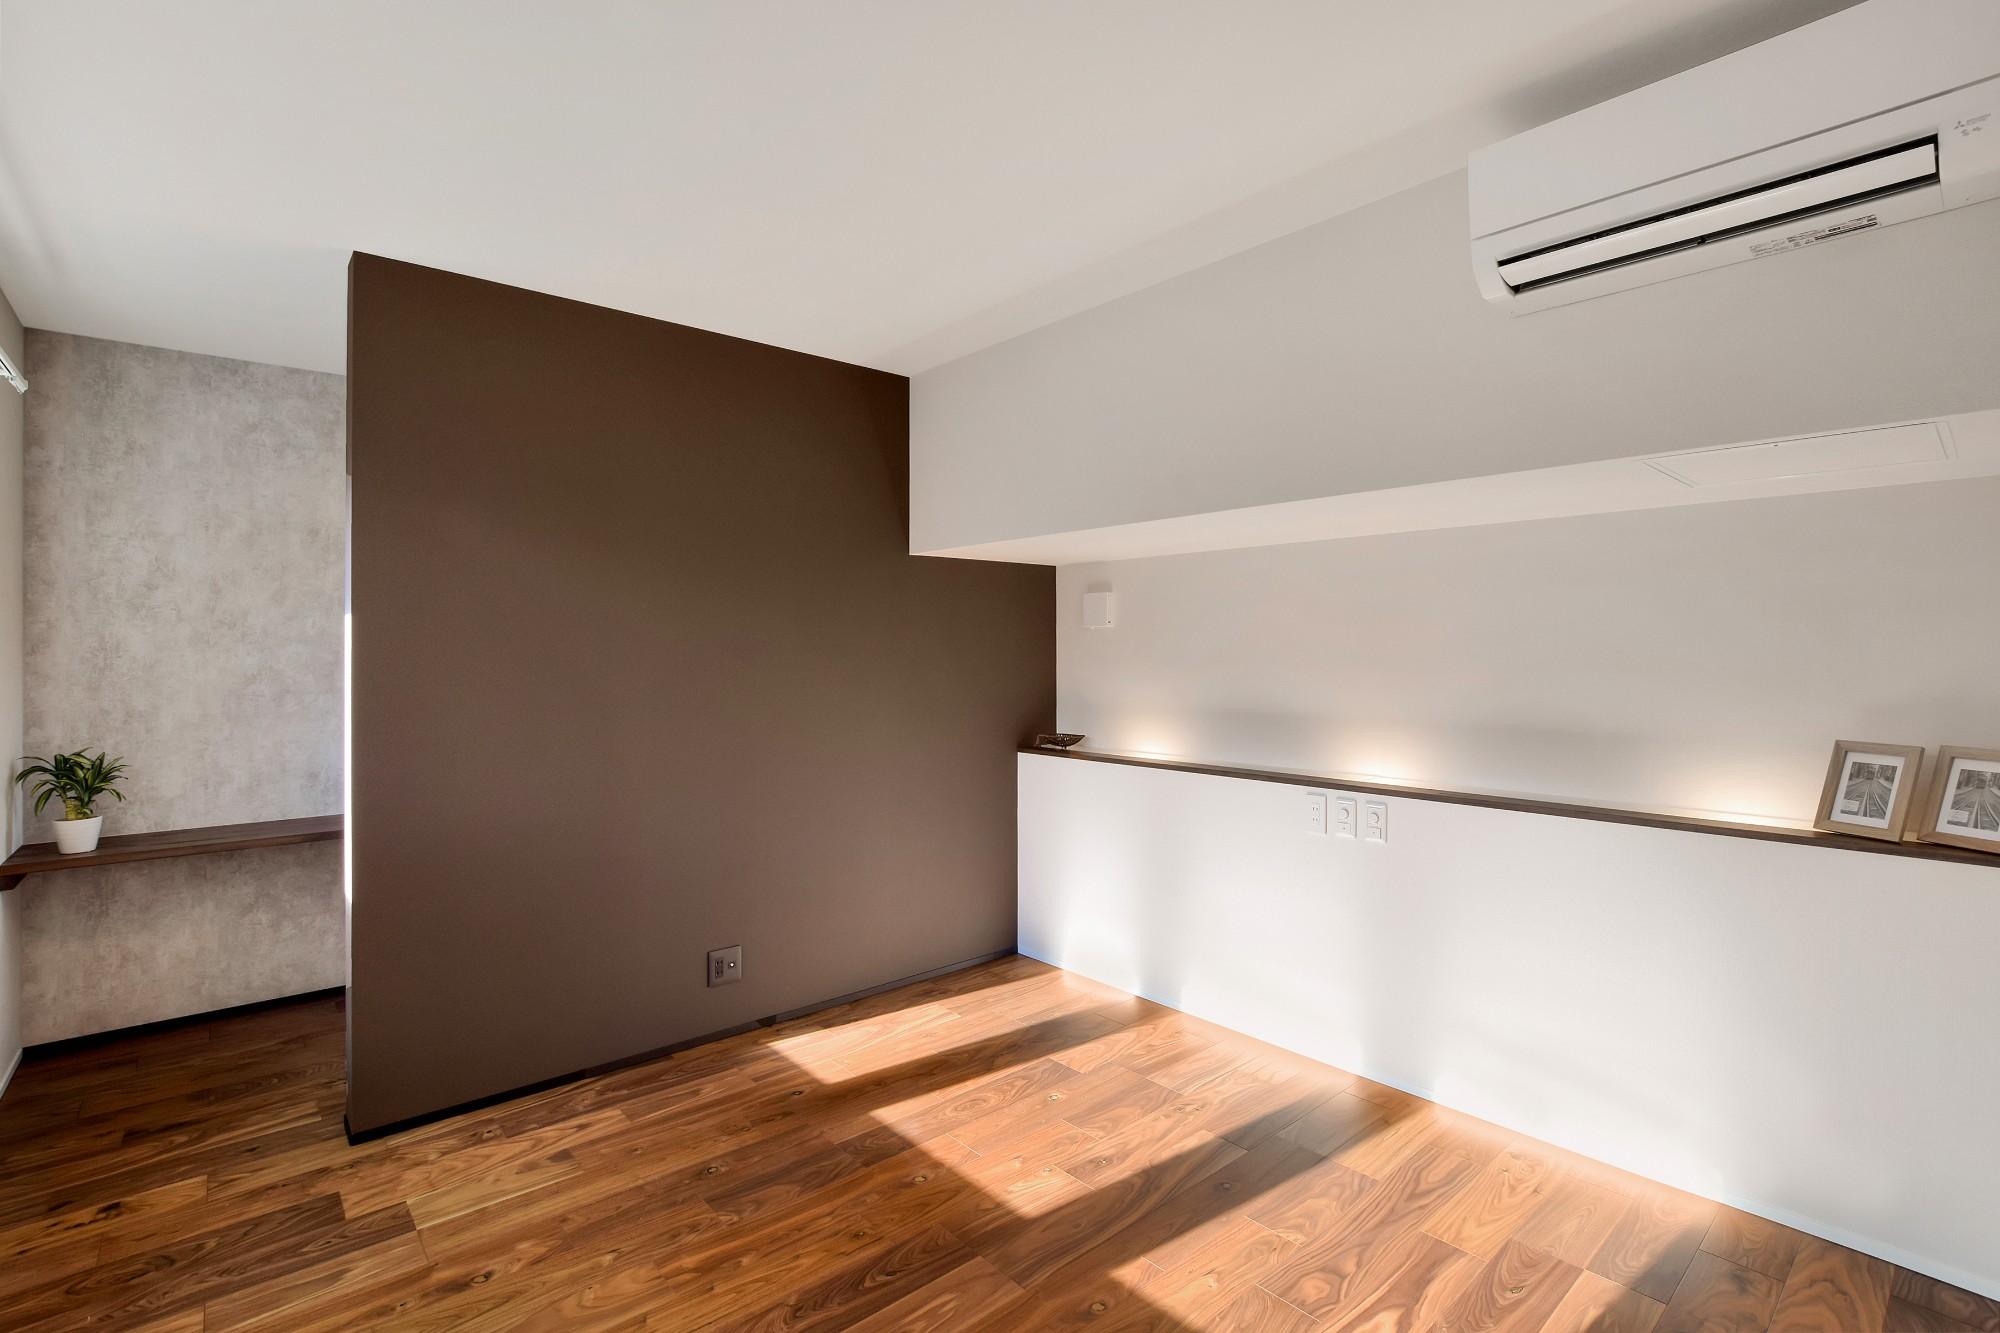 DETAIL HOME(ディテールホーム)「L字型LDKとプライベートデッキのある生活」のシンプル・ナチュラルな居室の実例写真